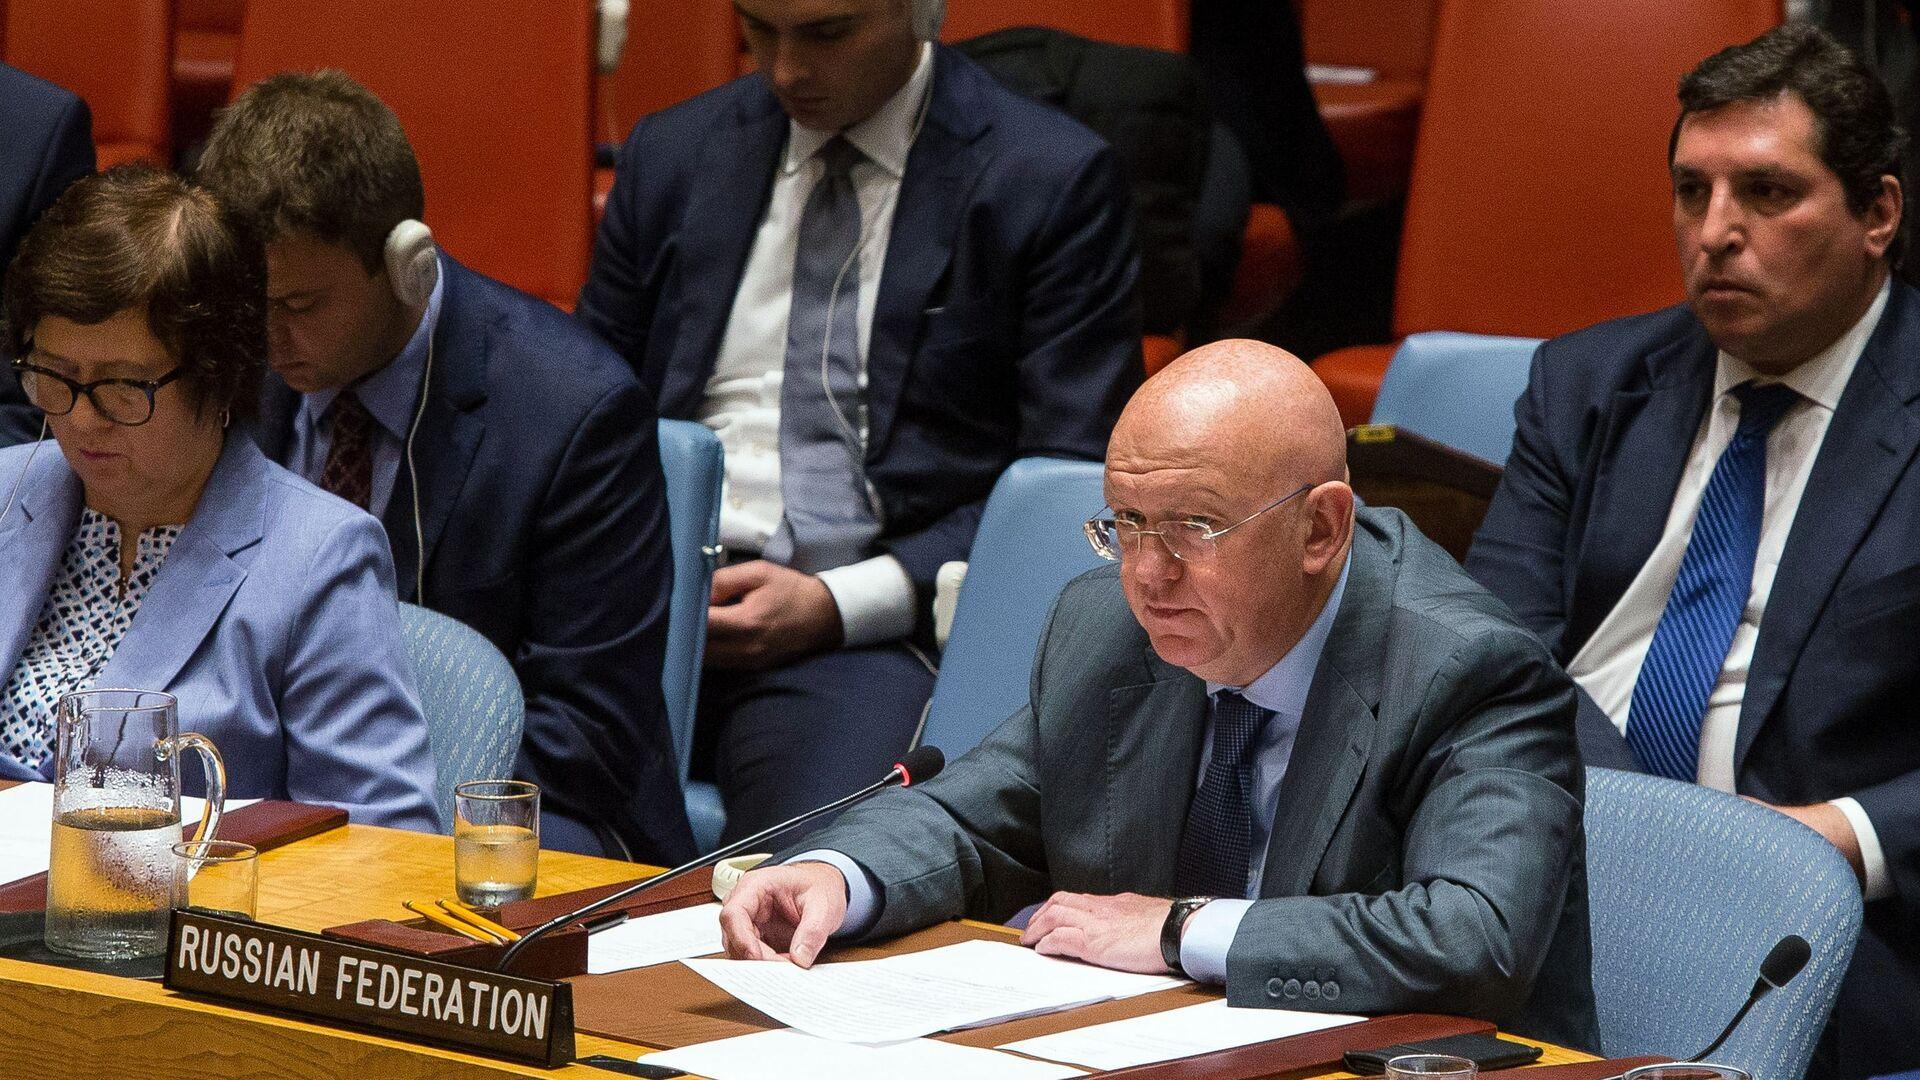 Заседание Совета безопасности ООН по Сирии - Sputnik Тоҷикистон, 1920, 17.08.2021